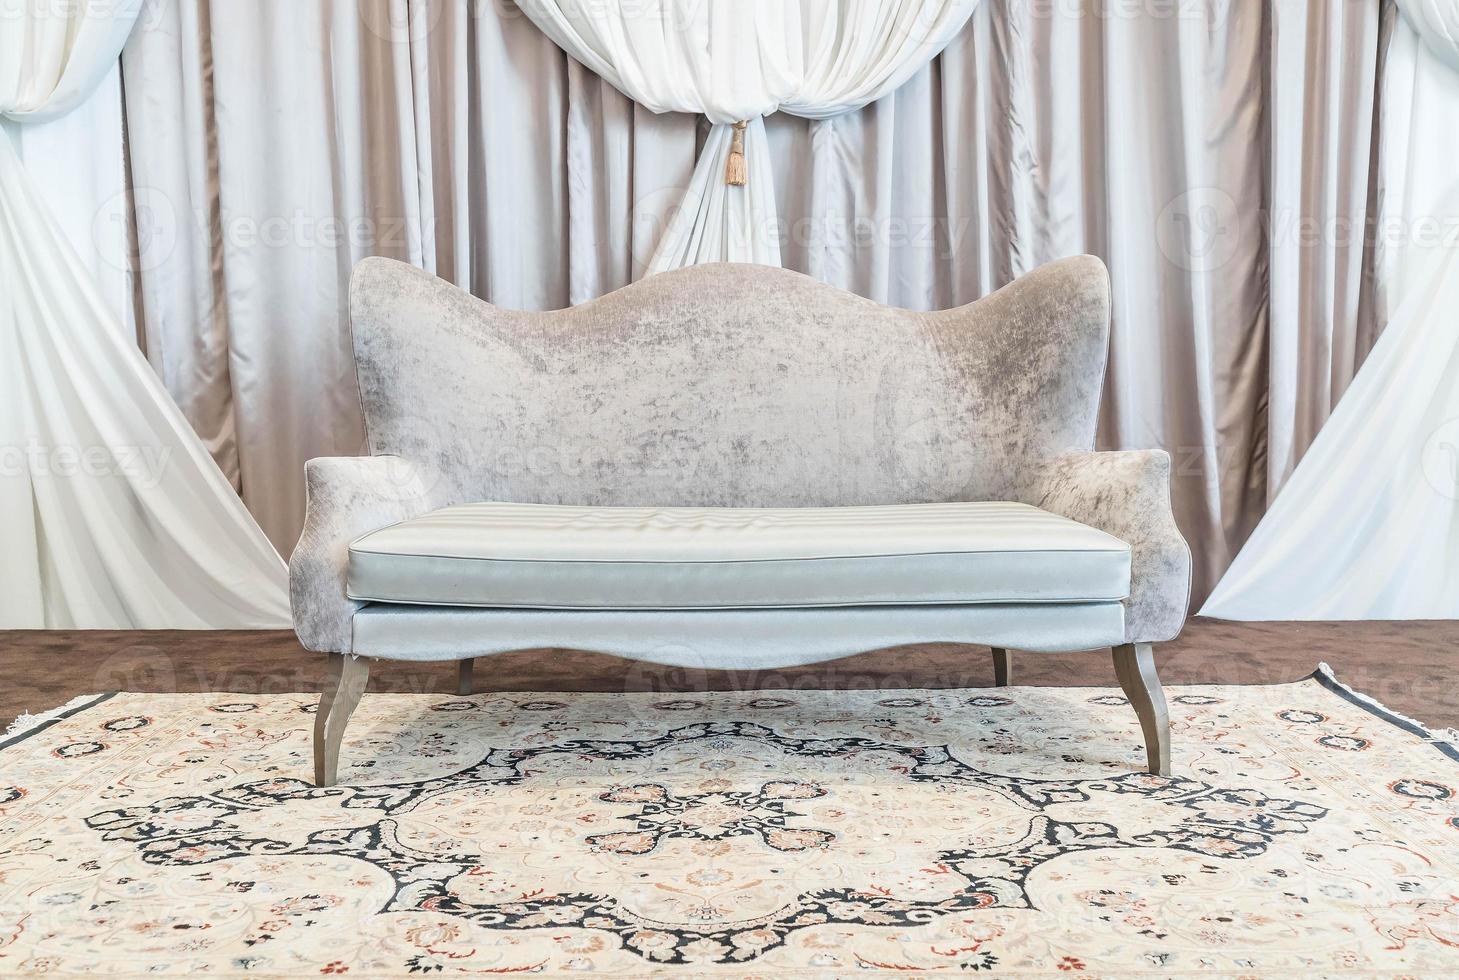 Empty beautiful and luxury sofa photo